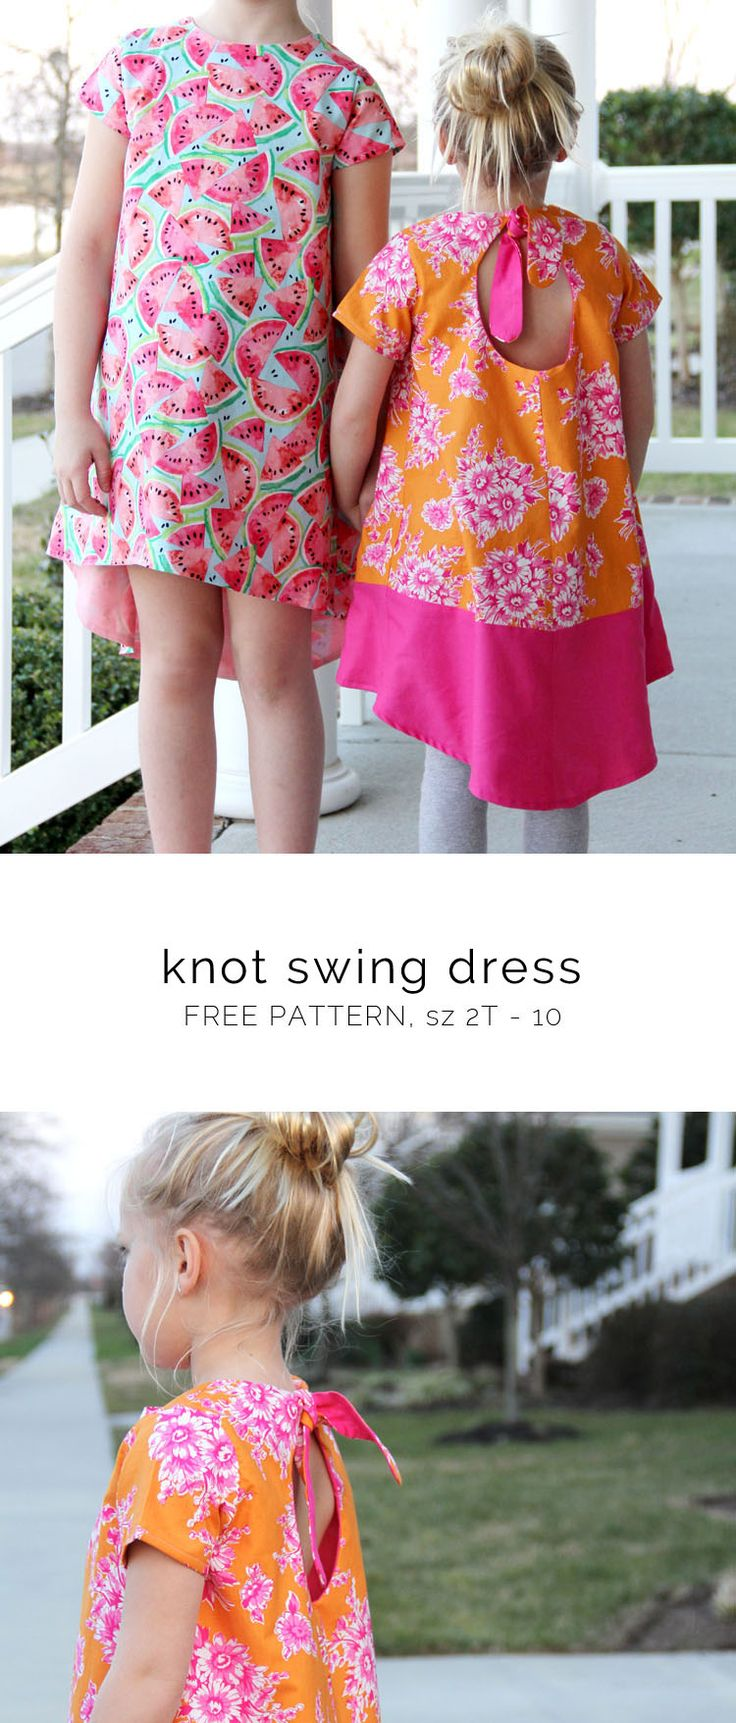 Knot Swing Dress Pattern {free pattern} || Easy summer kids dress to sew for sizes 2T thru 10